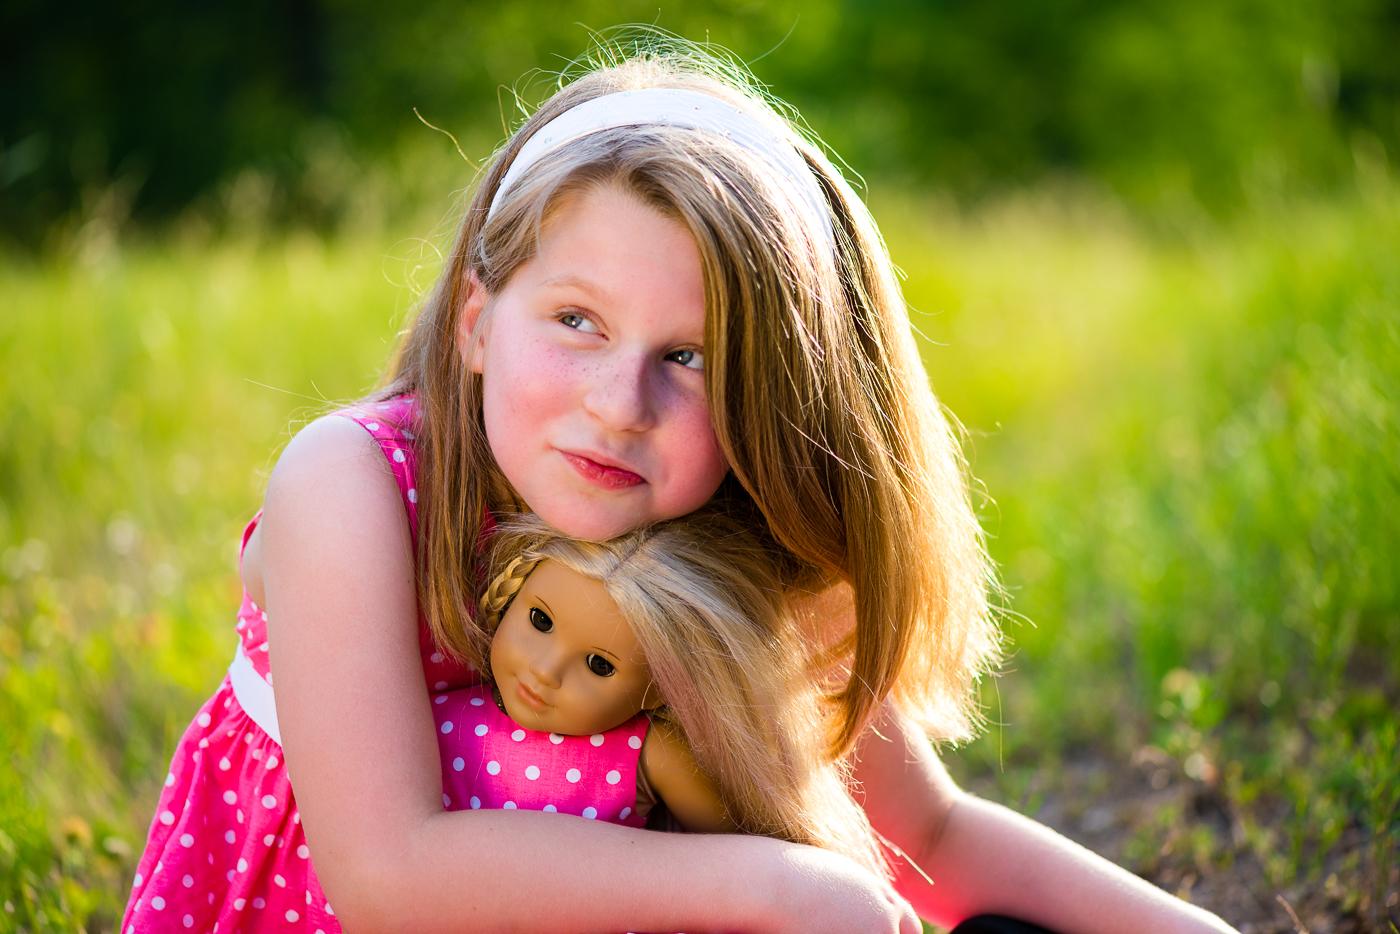 Girl_pink_dress_doll_bear_10.jpg